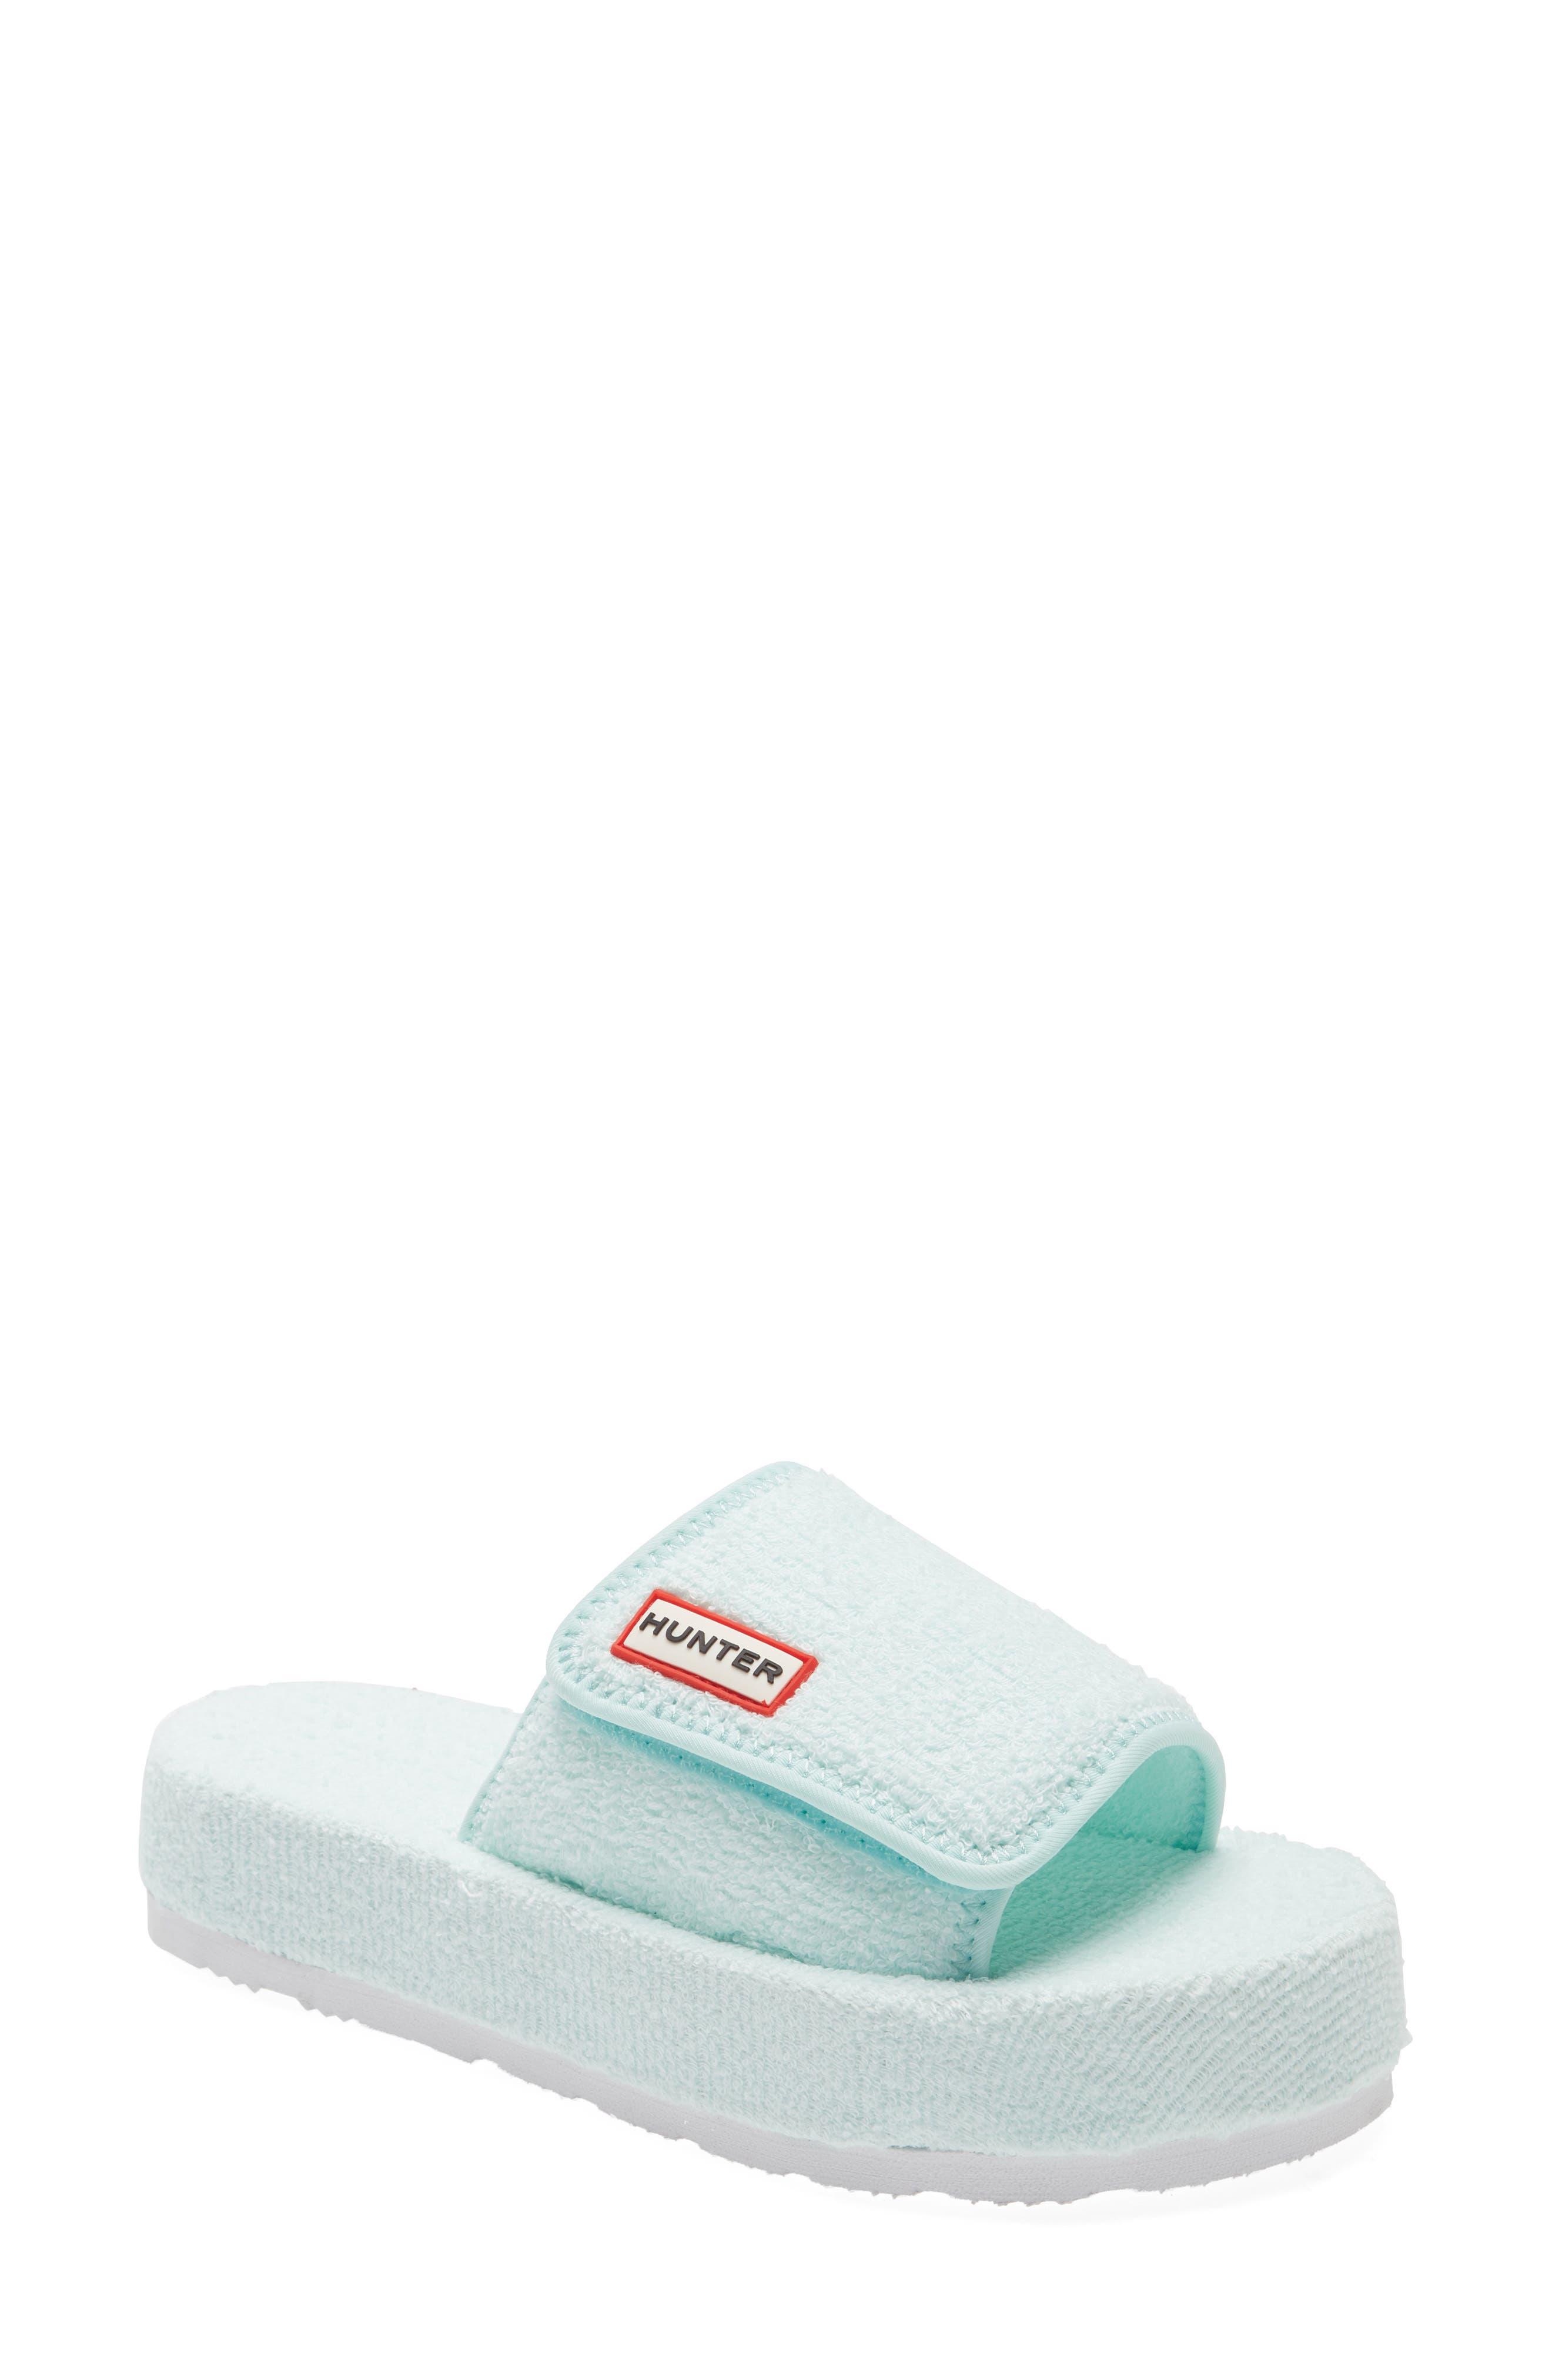 Terry Toweling Beach Sandal